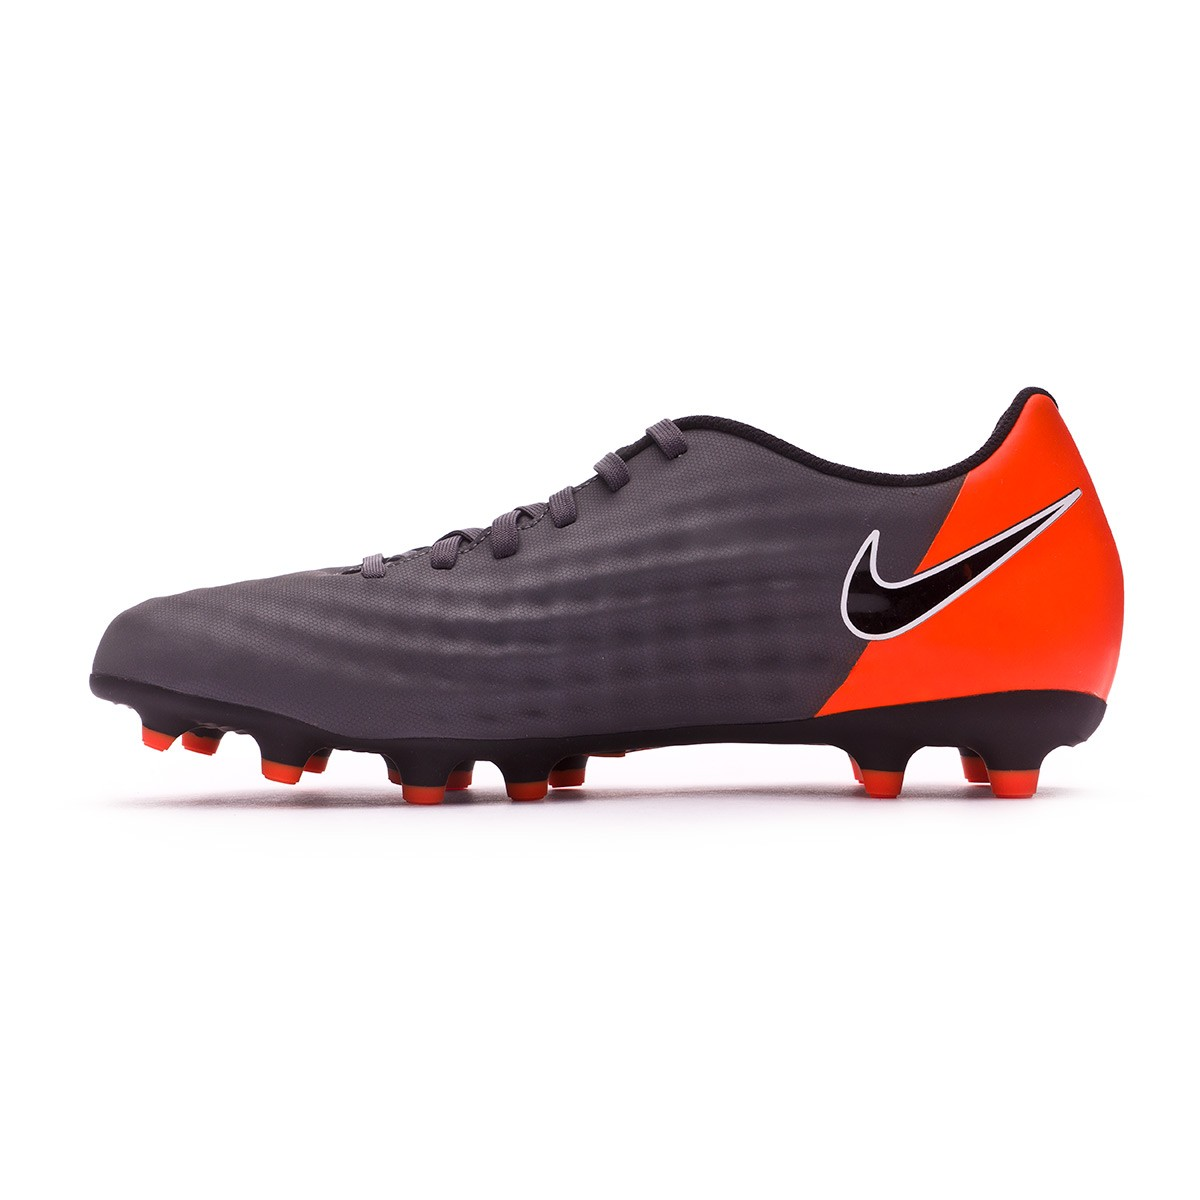 62a04d90713f Football Boots Nike Magista Obra II Club FG Dark grey-Black-Total orange- White - Football store Fútbol Emotion